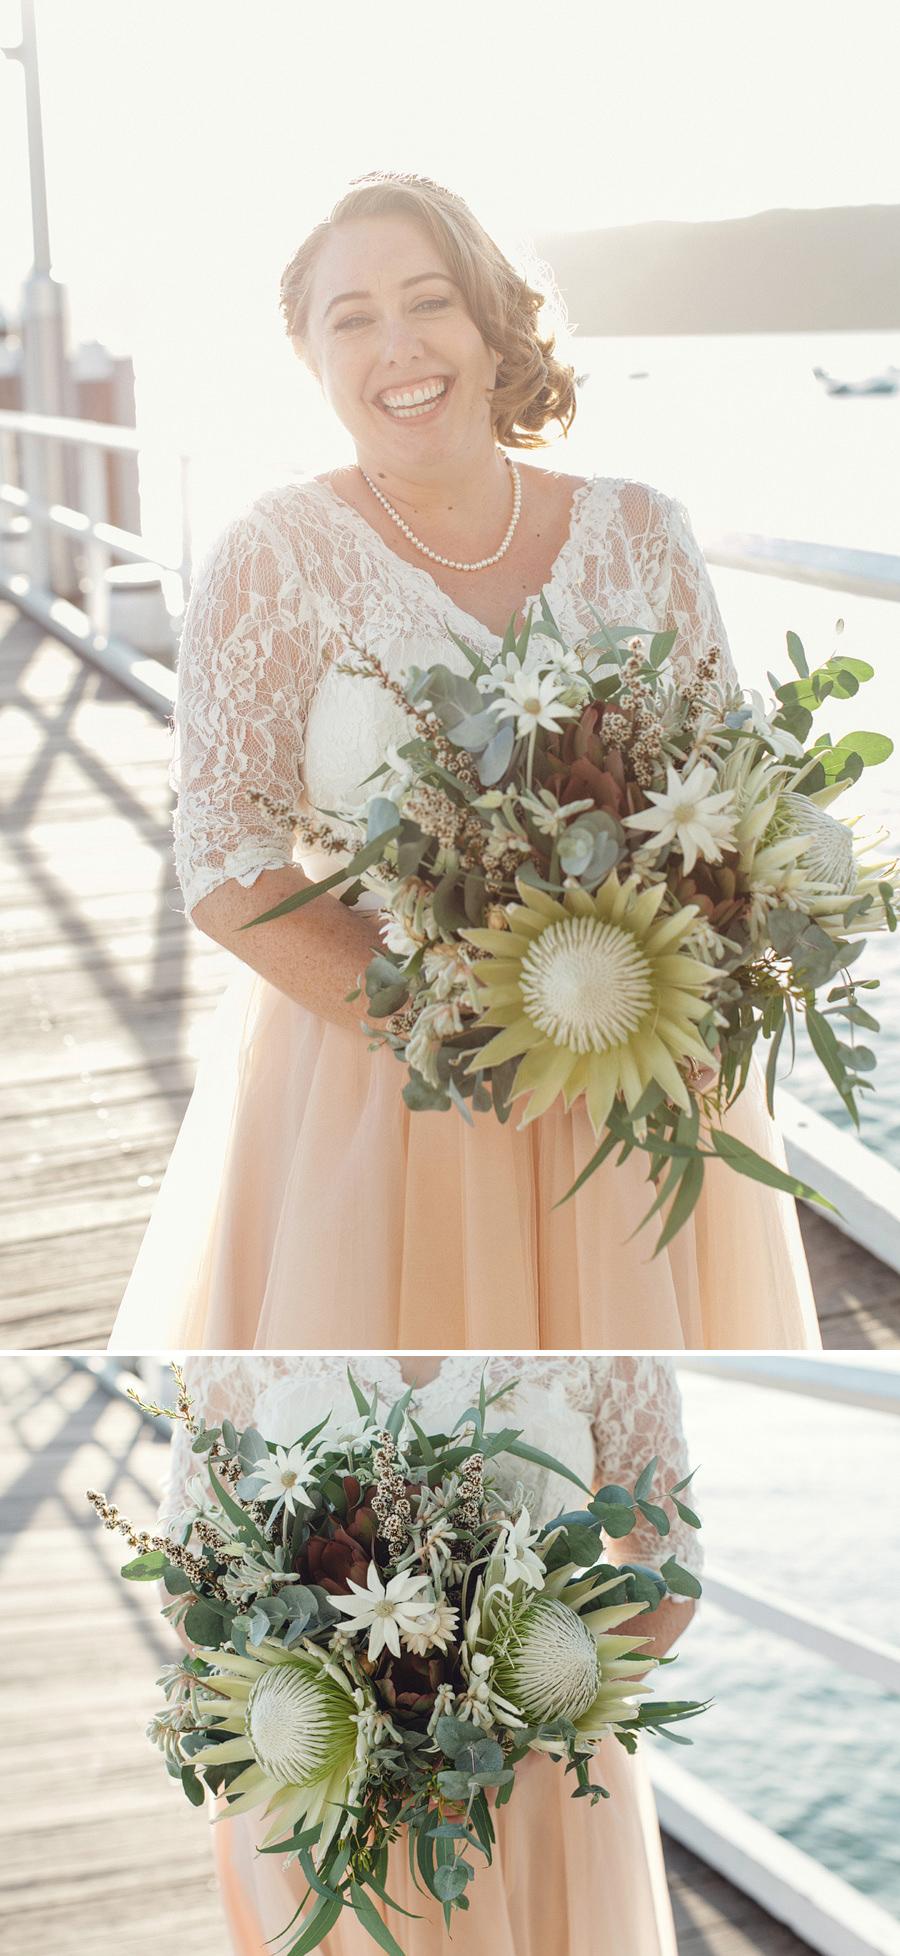 Pittwater Wedding Photography: Bride & Groom portraits